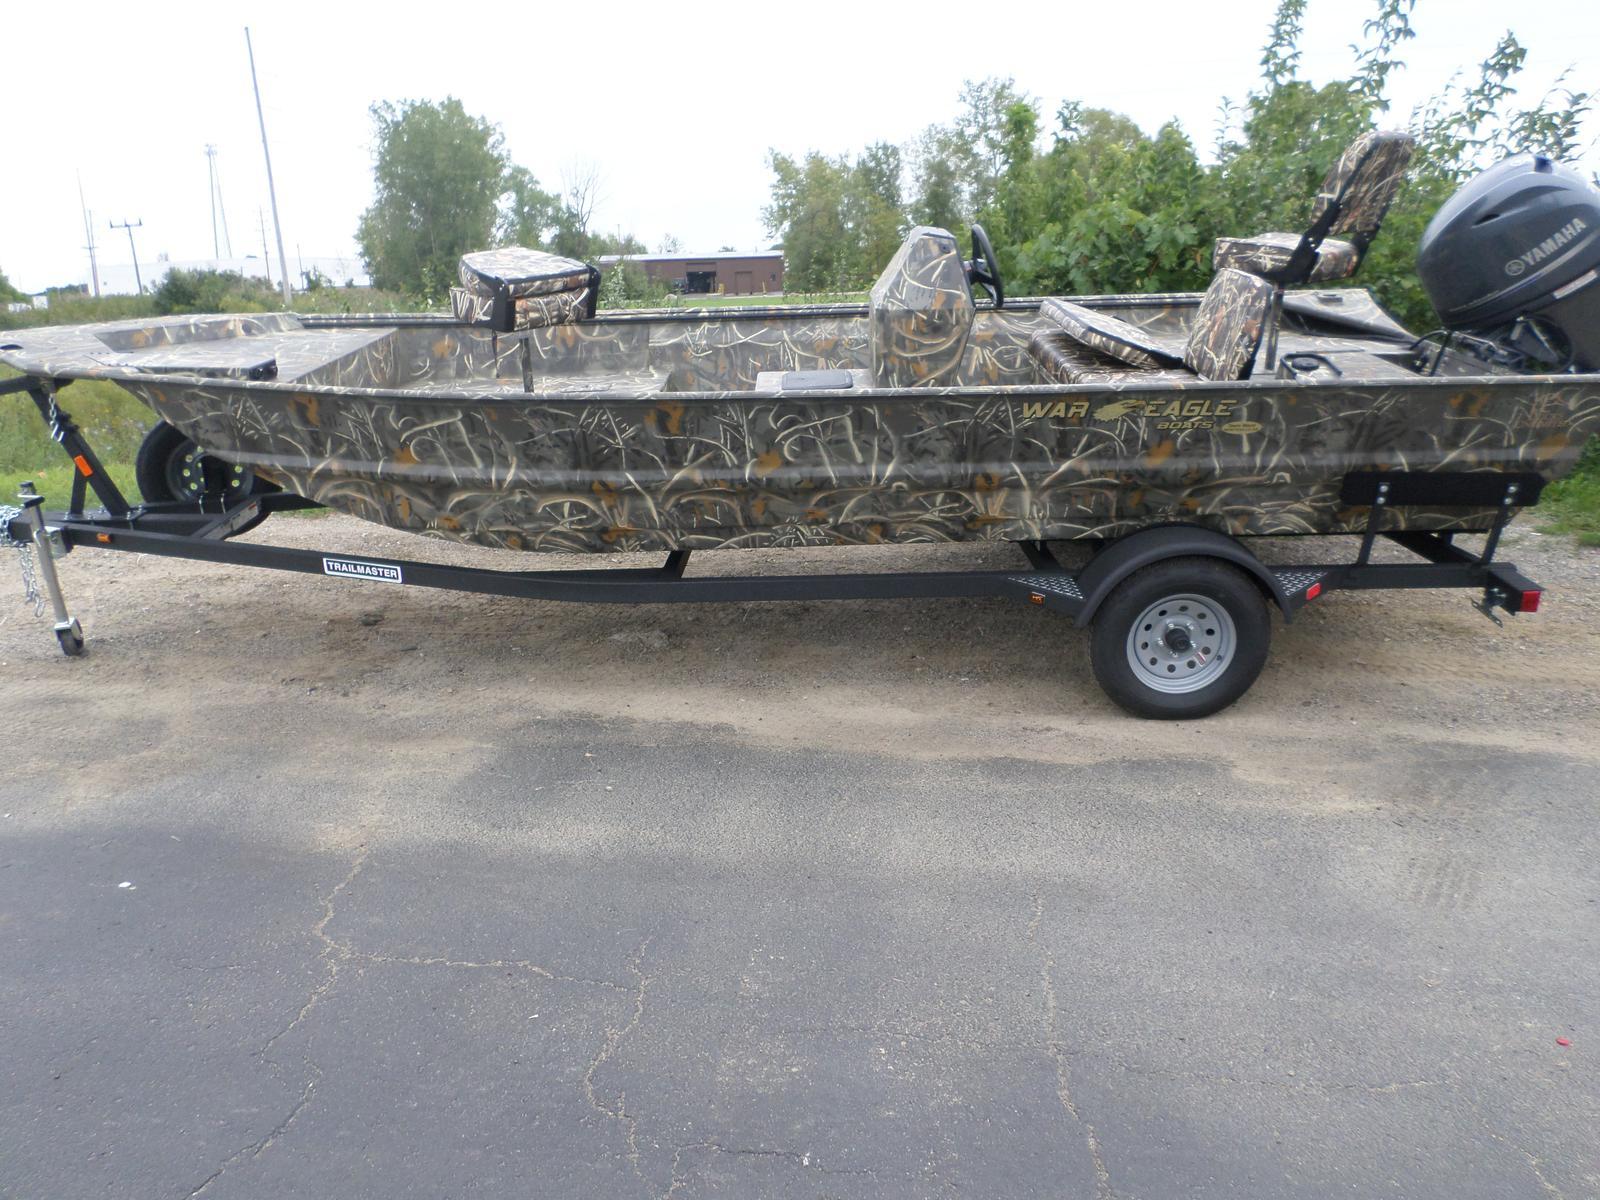 War Eagle Boats For Sale >> War Eagle Boats For Sale In Michigan Boat Trader